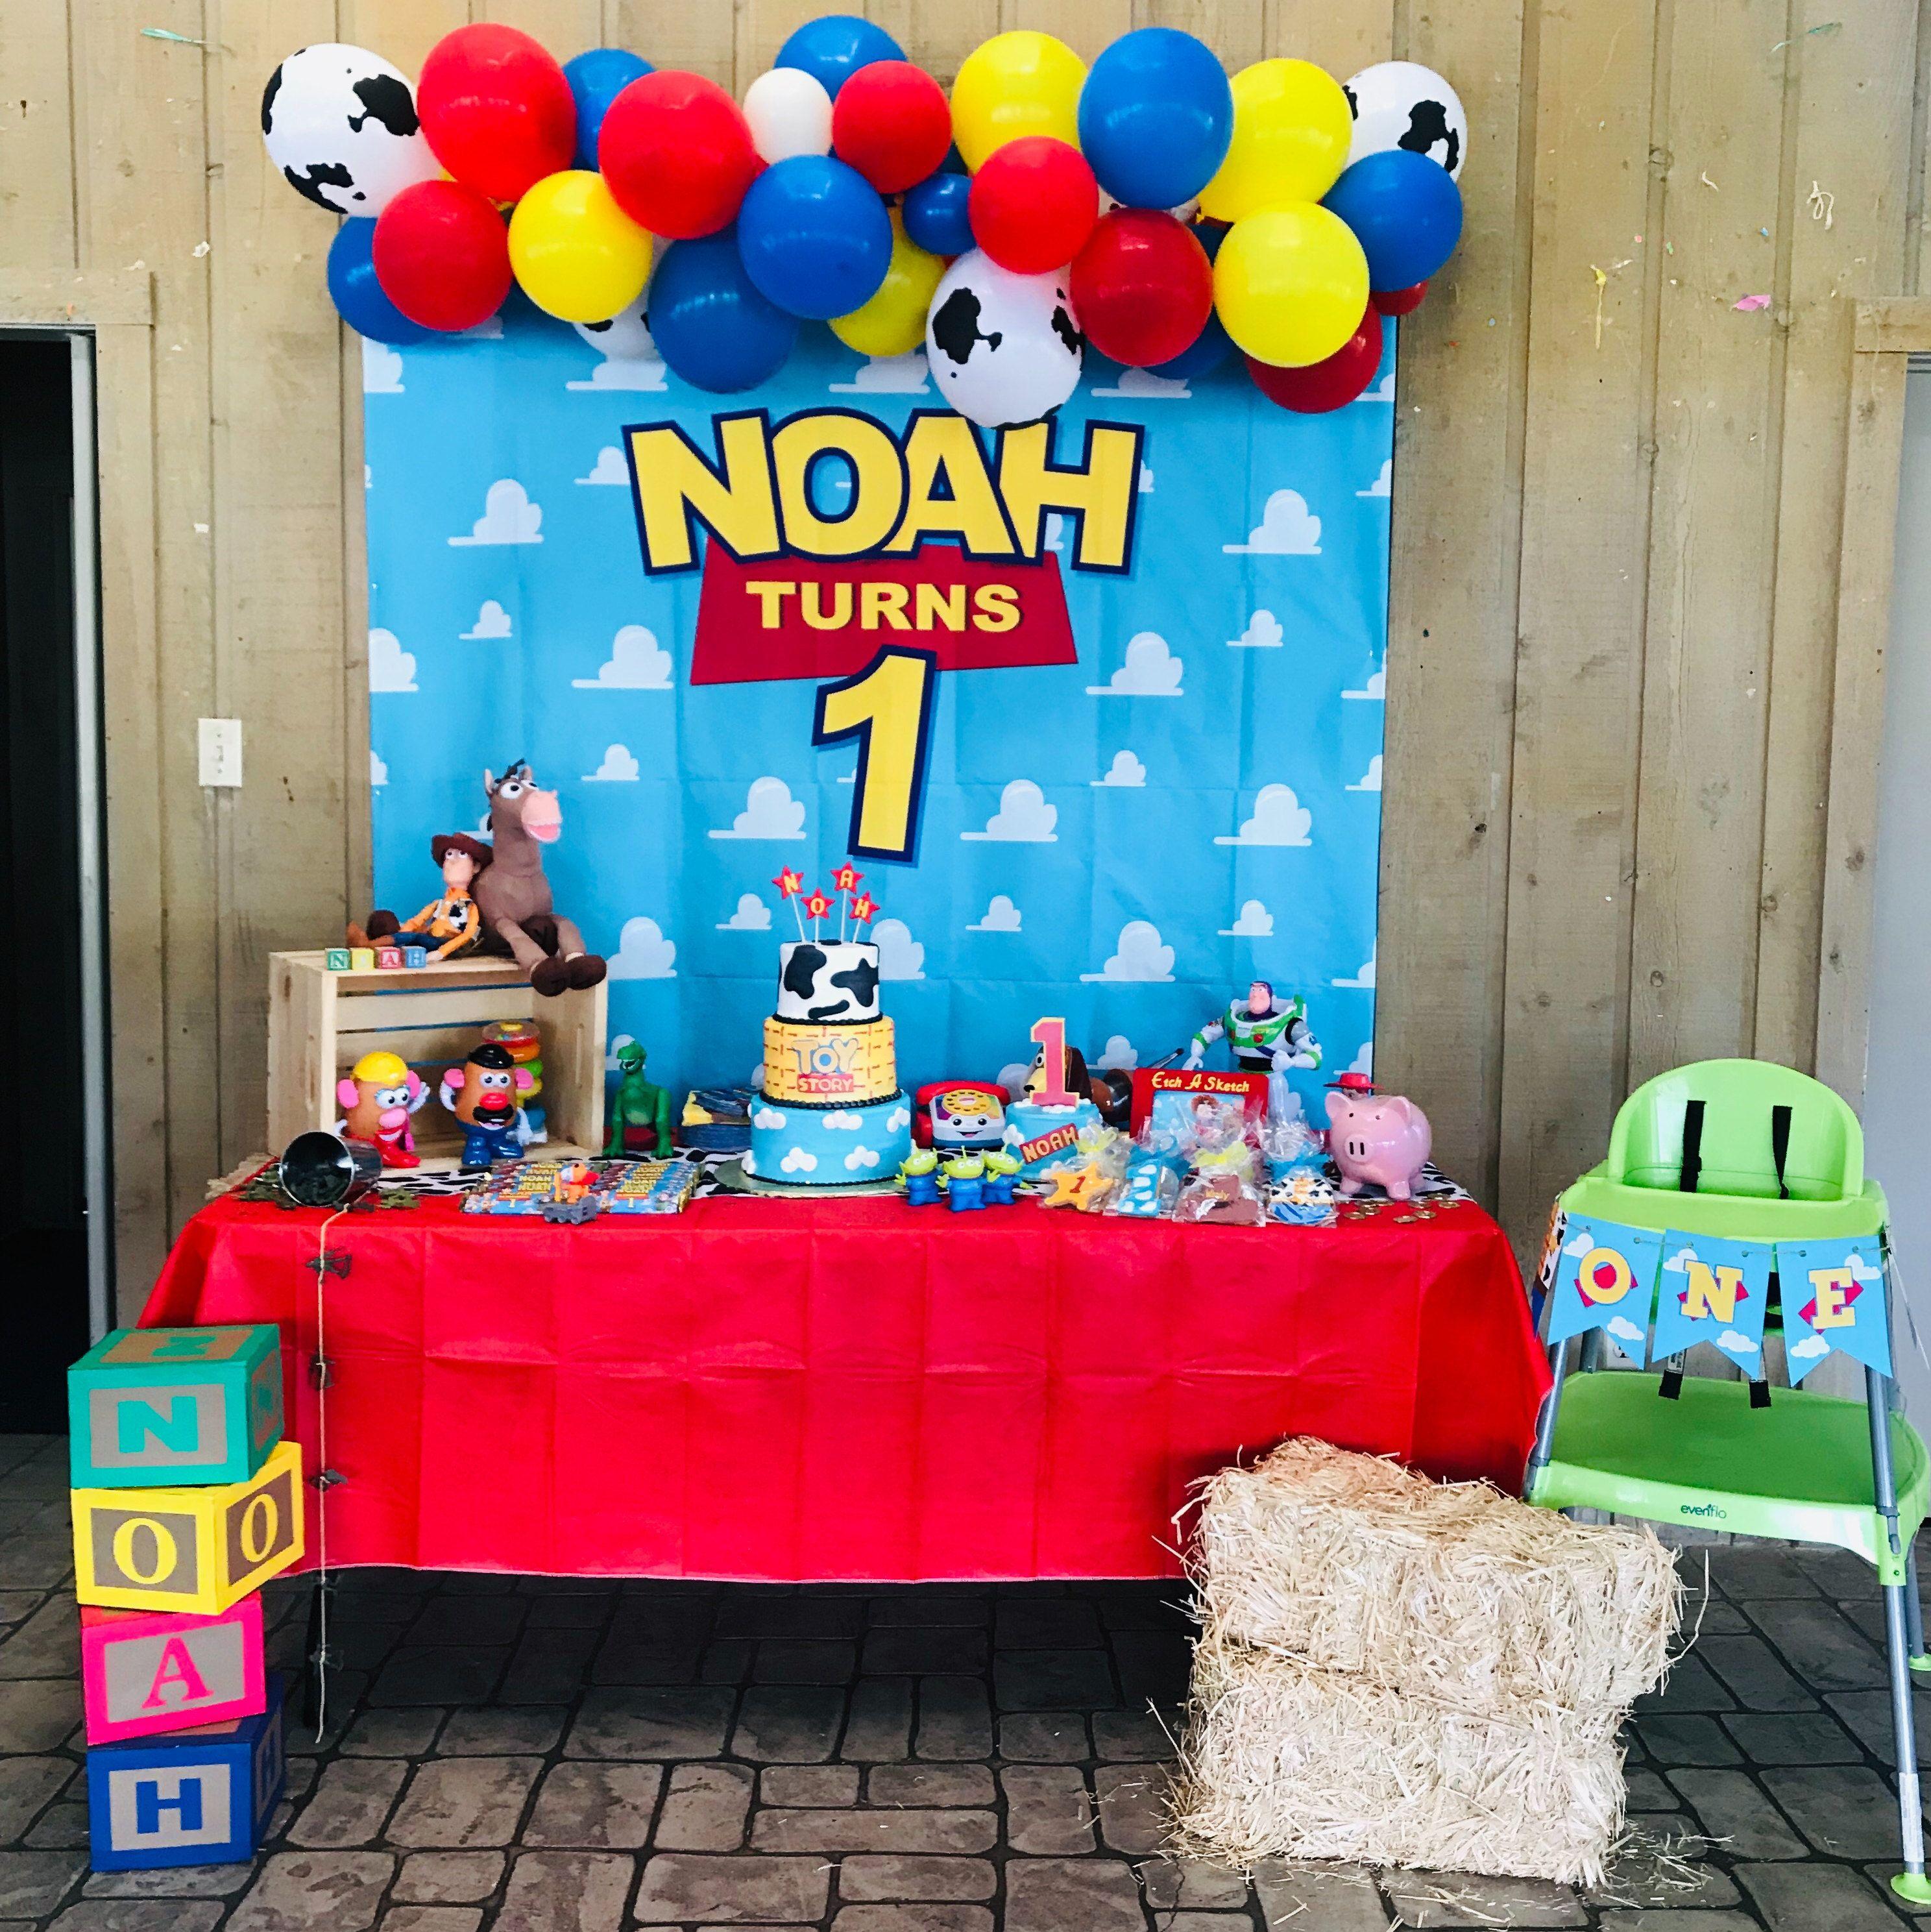 Balloon garland diy kit toy story theme in 2020 birthday